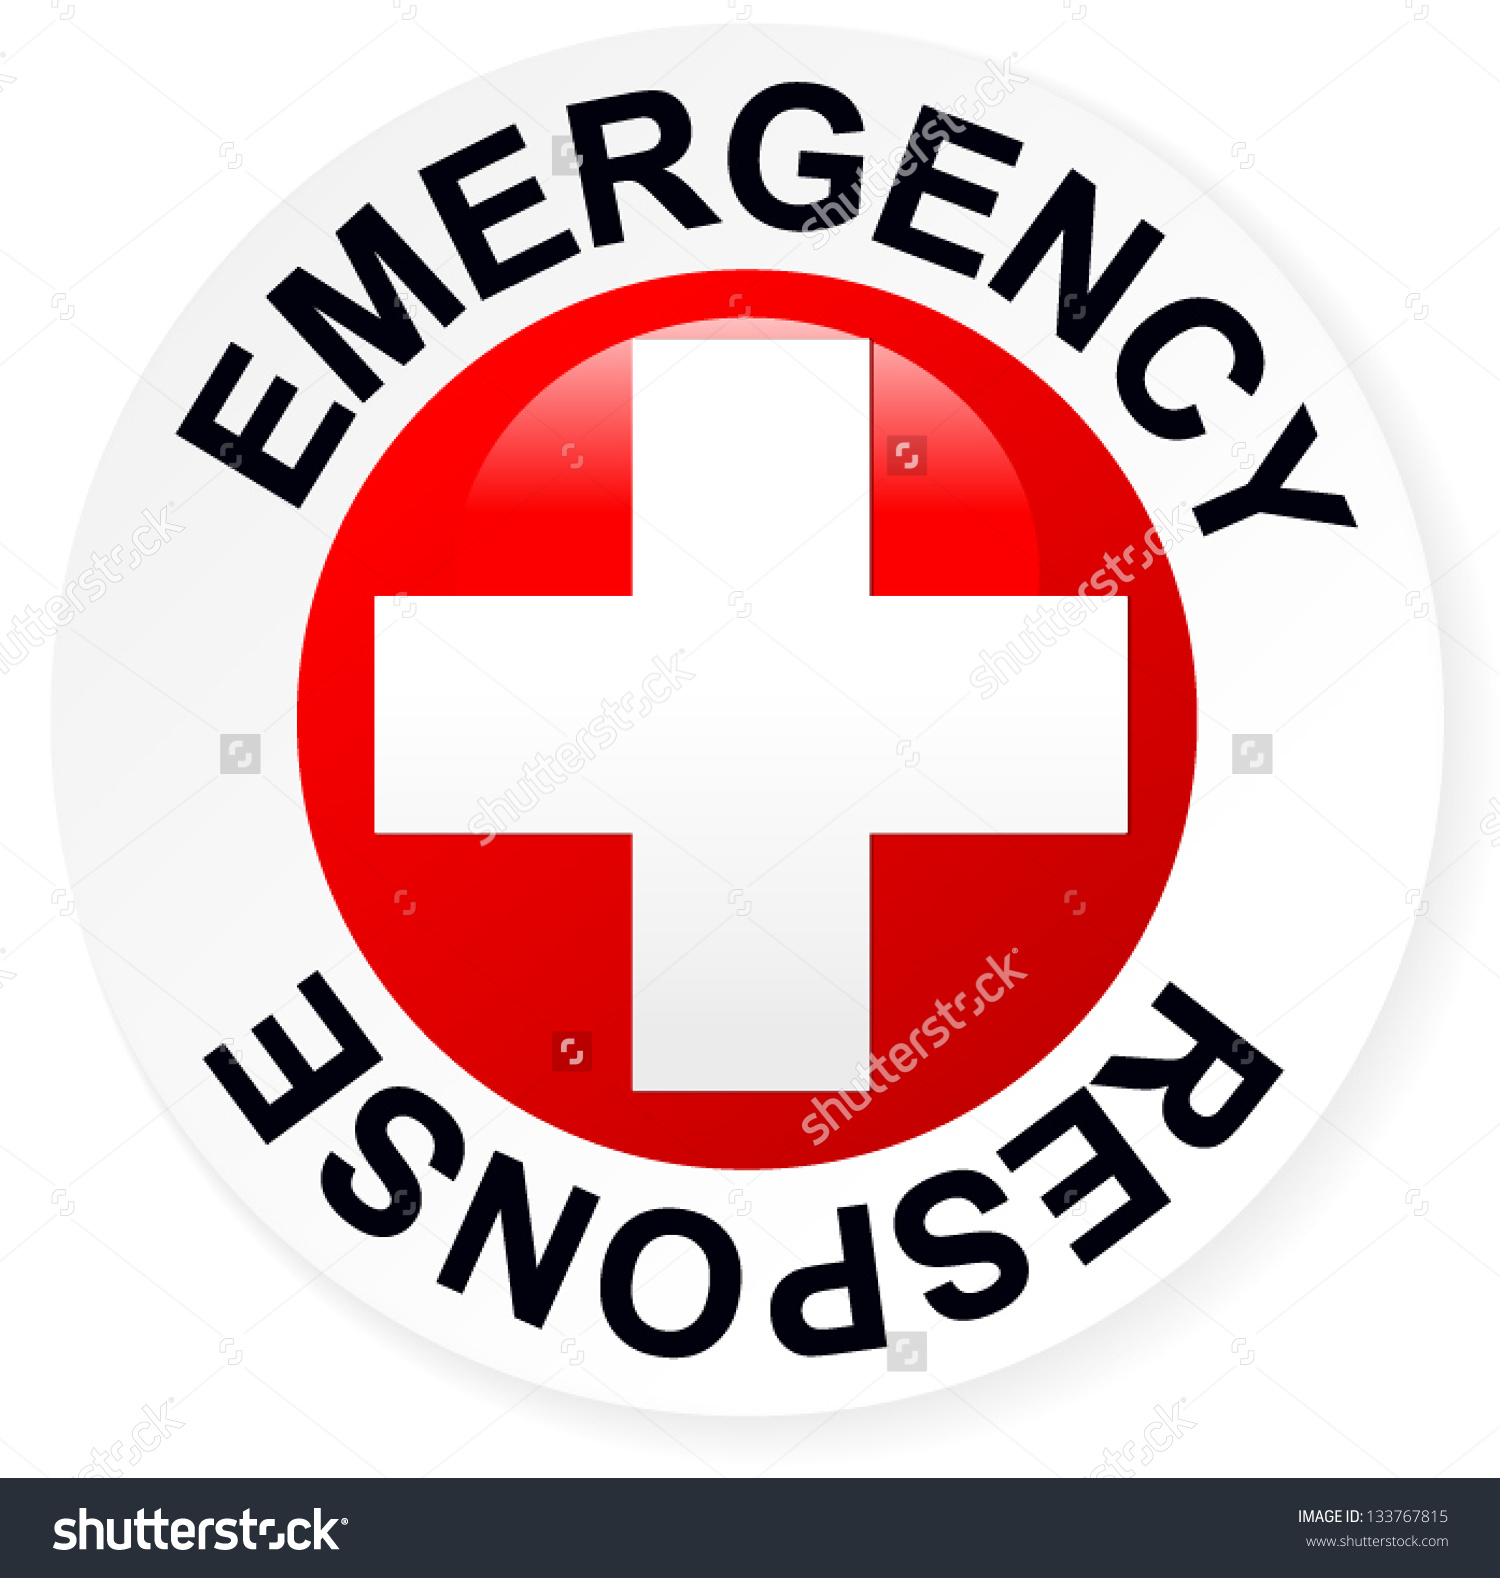 Emergency clipart emergency response. Preparedness free download best